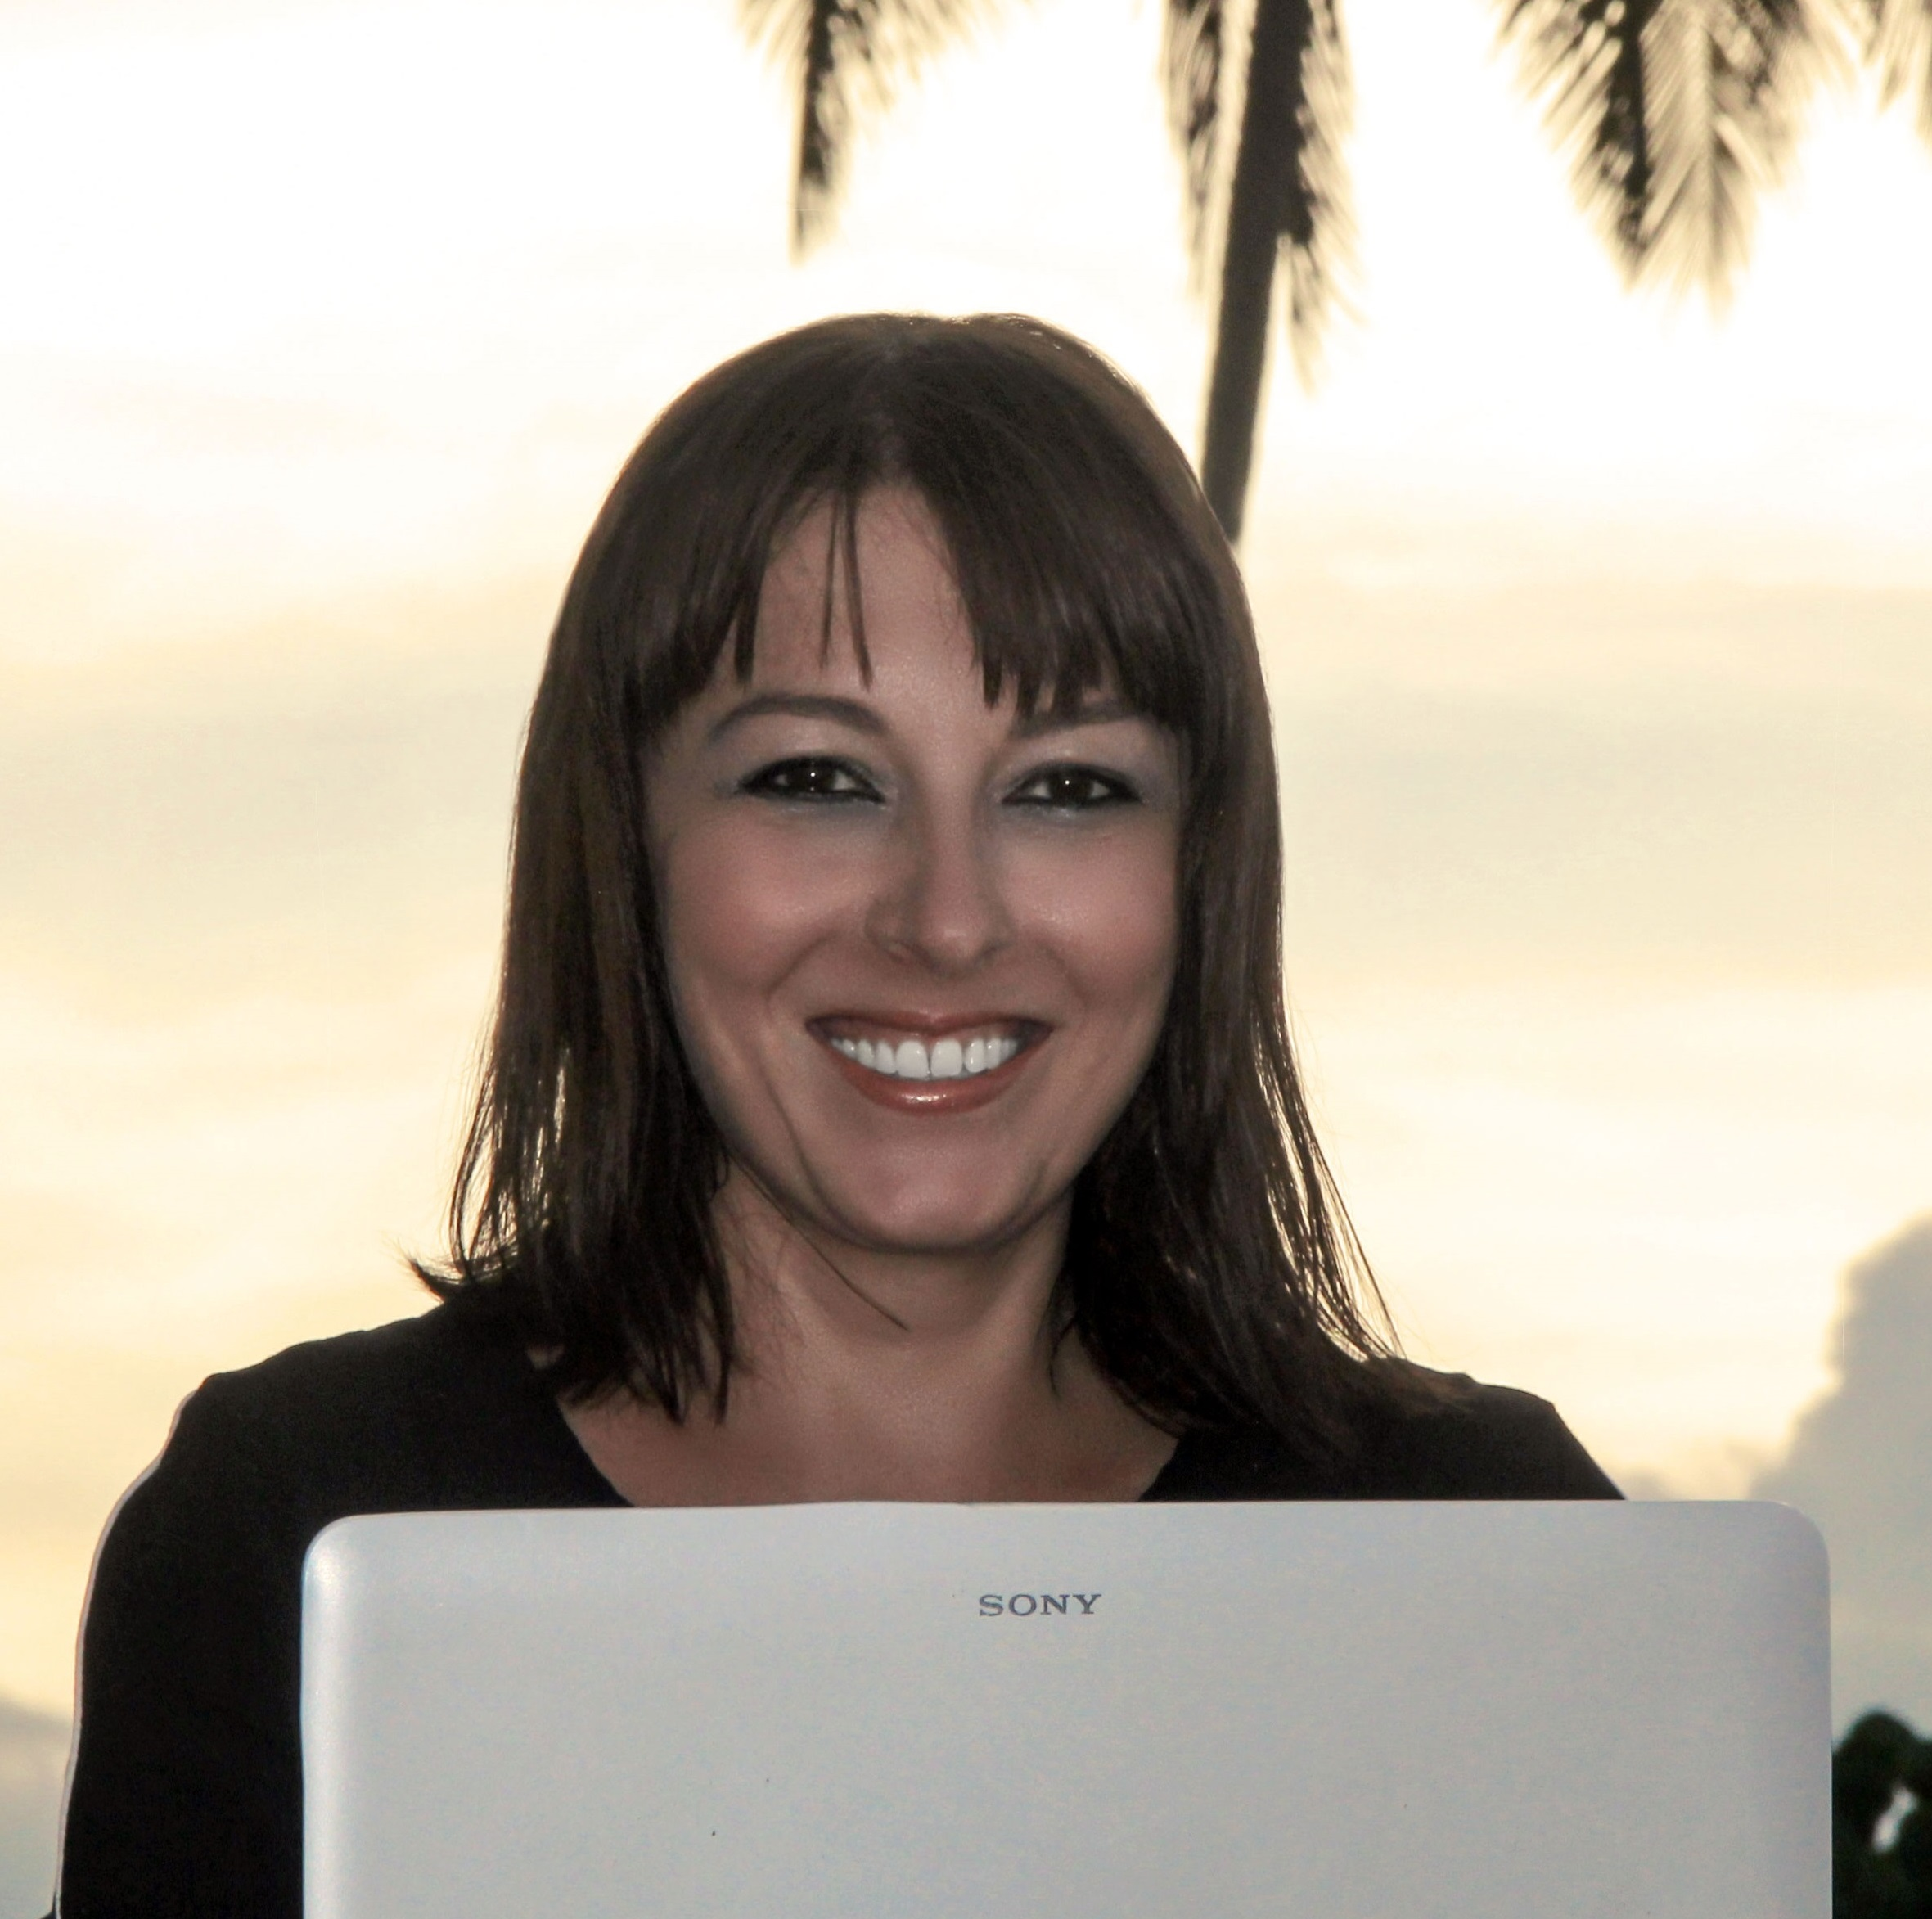 Erica Stori